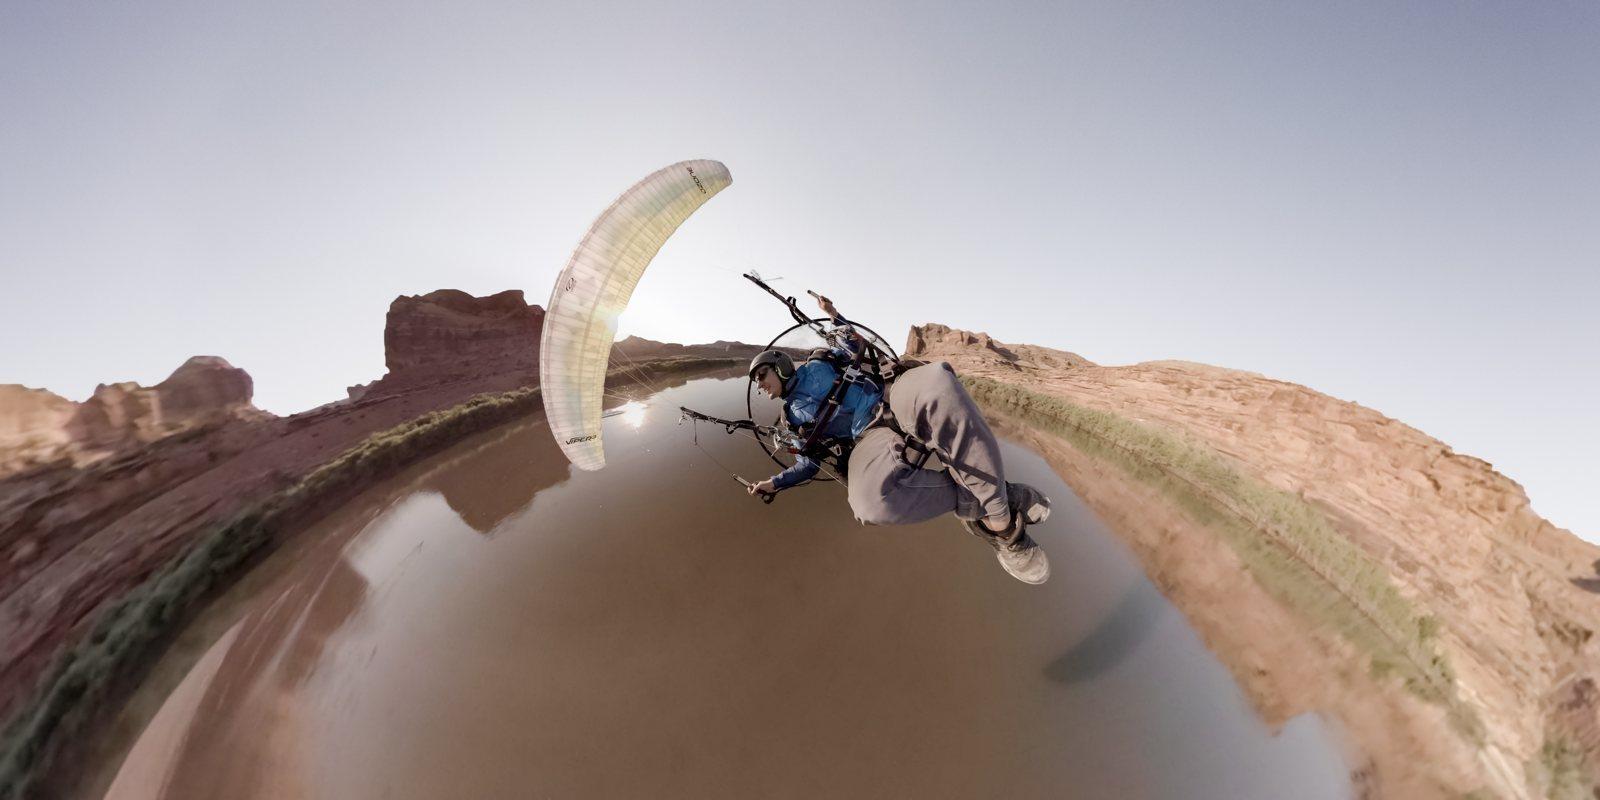 Панорамная камера GoPro Fusion 360 (CHDHZ-103) съемка